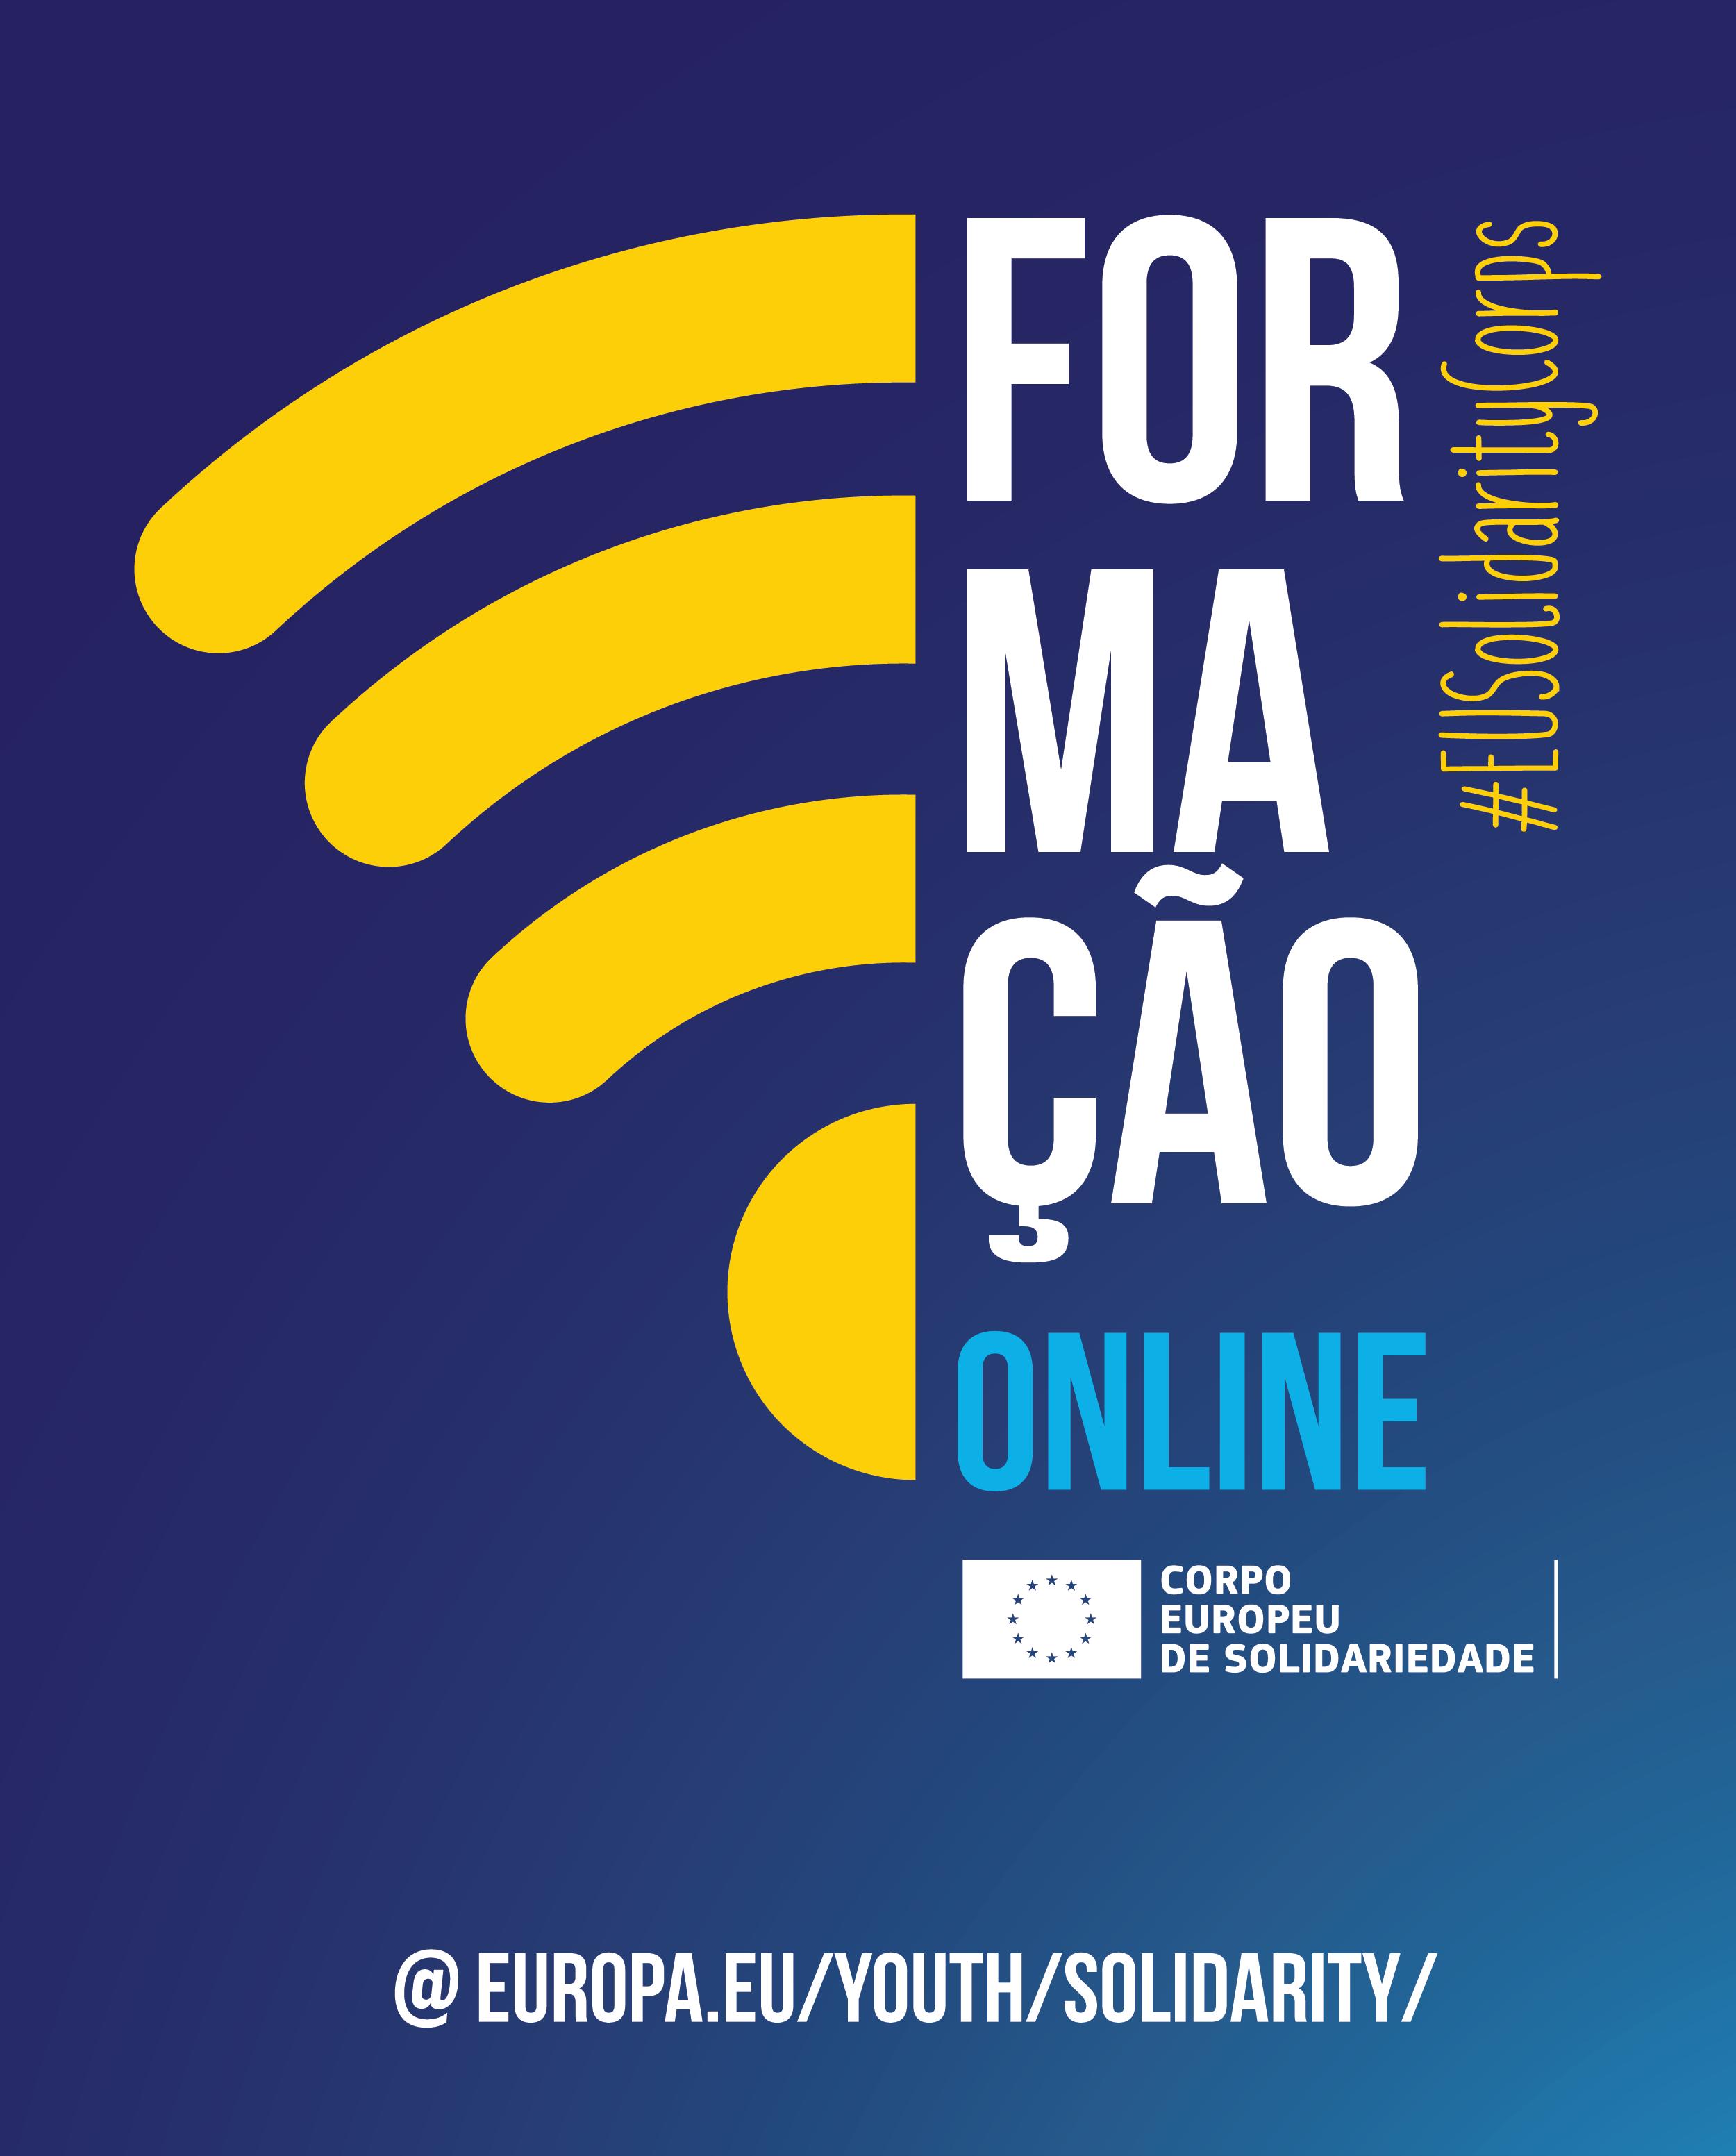 FORMACAO ONLINE | CORPO EUROPEU DE SOLIDARIEDADE (CES)